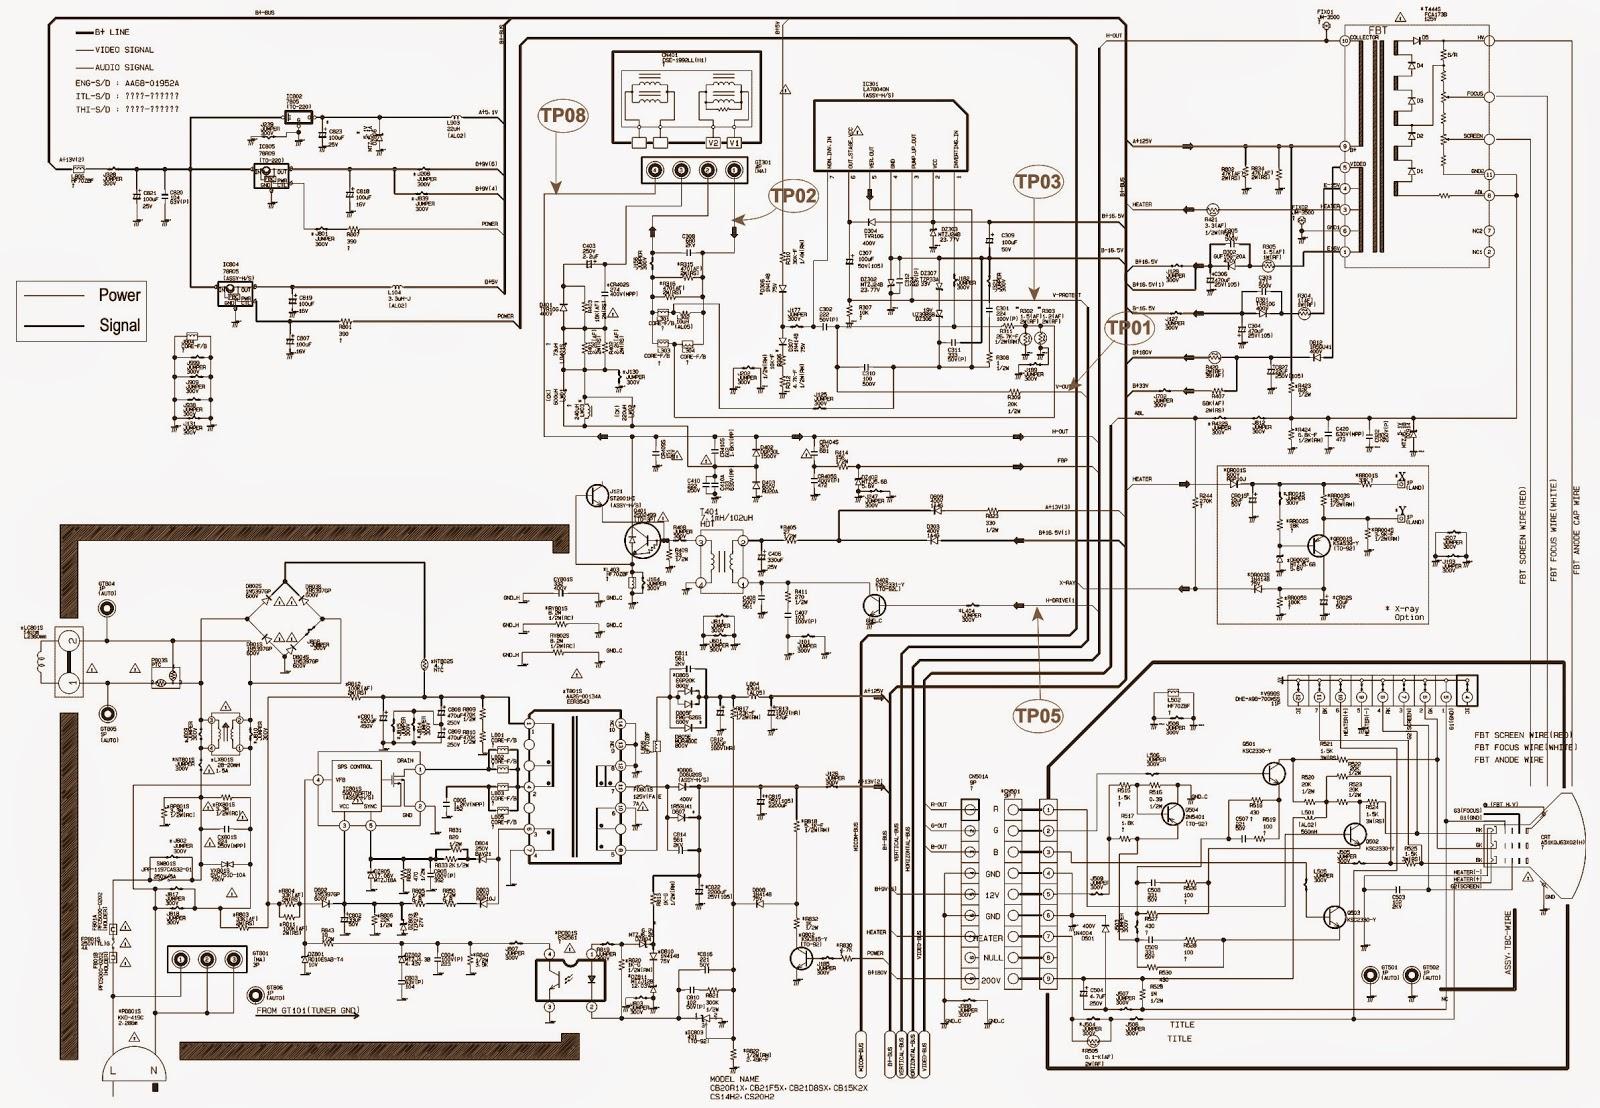 samsung cb21k40 schematic diagram schematic diagrams rh schematicscom blogspot com samsung plasma tv schematic diagram samsung tv schematic diagram.pdf